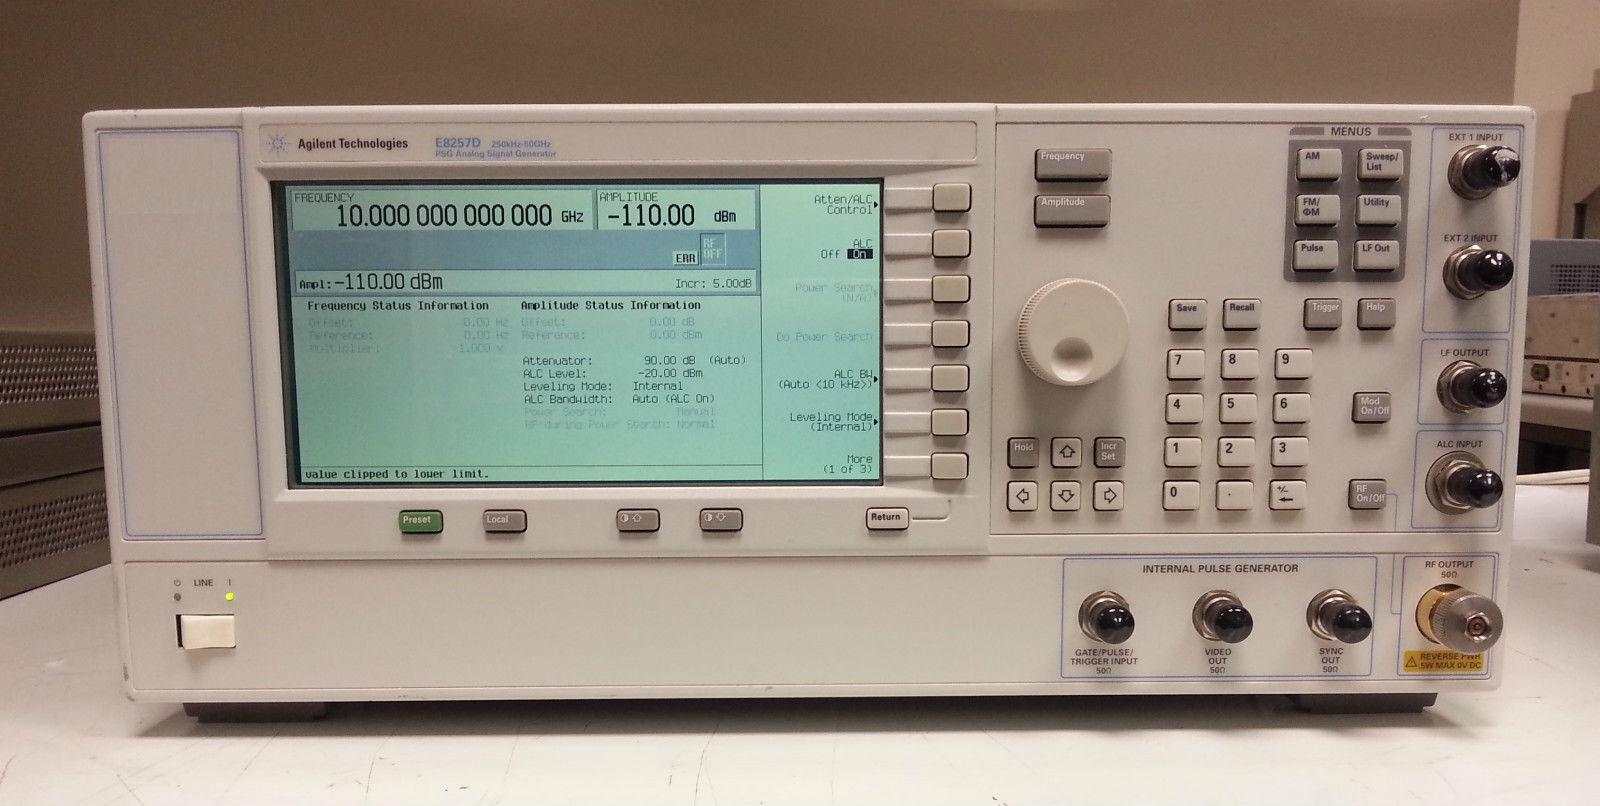 Agilent/HP E8257D PSG Analogue Signal Generator